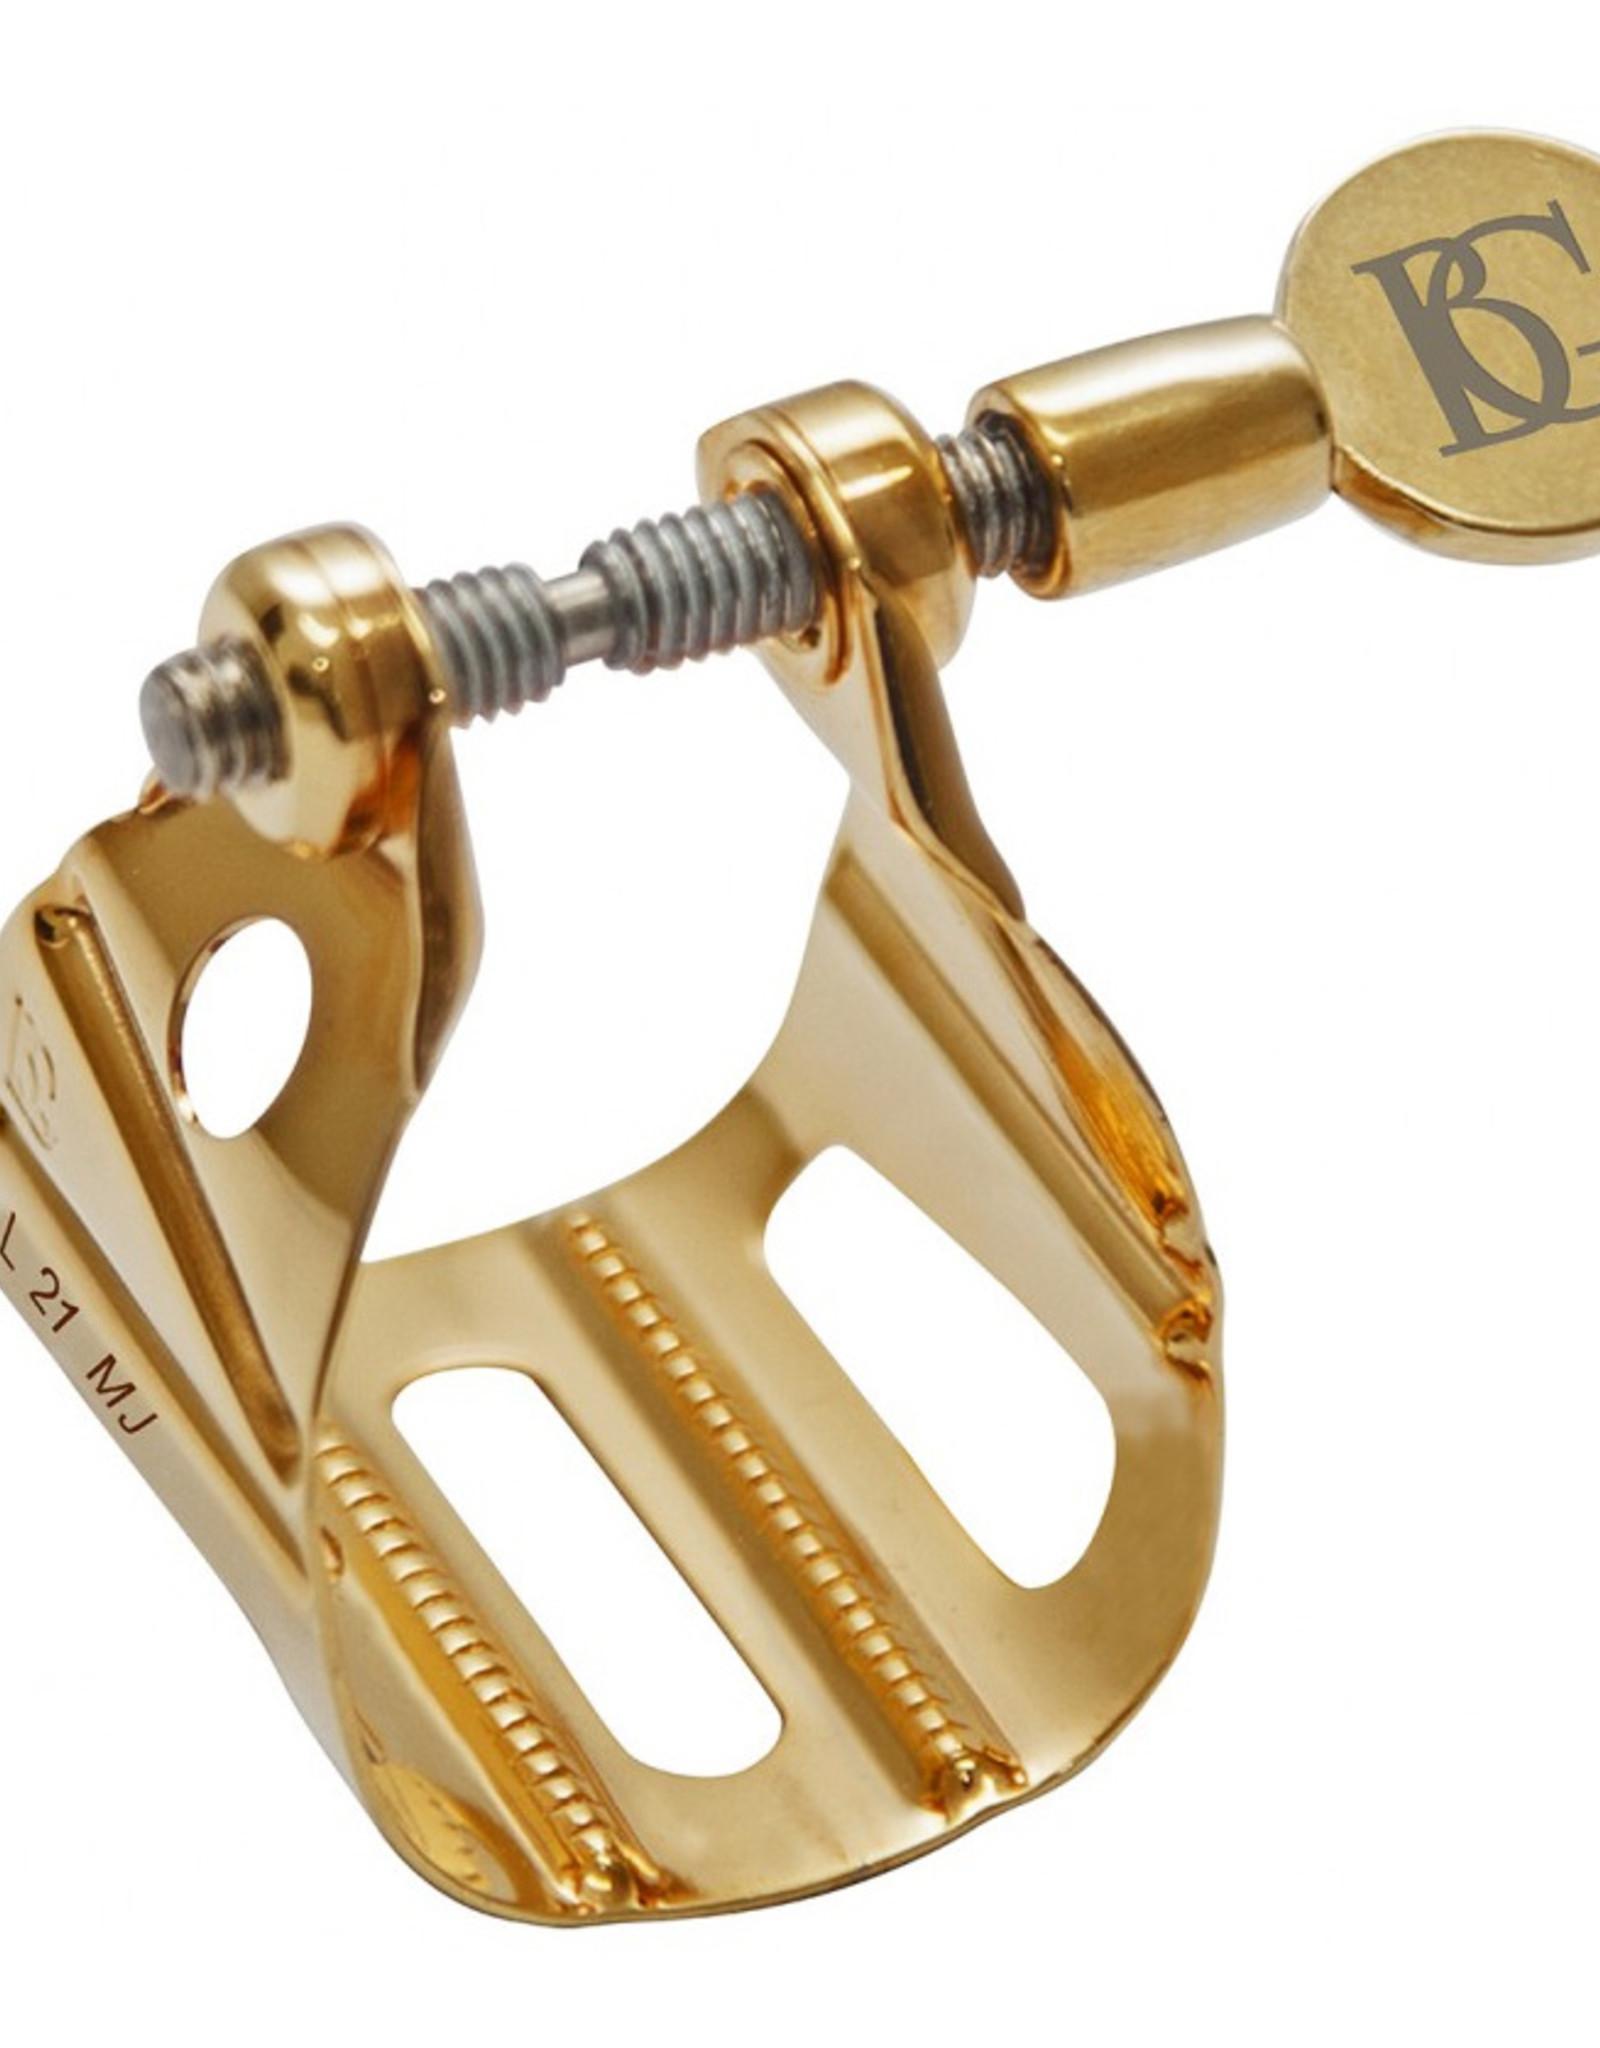 BG France BG gold plated Metal Jazz Saxophone Ligature Tenor L21 MJ